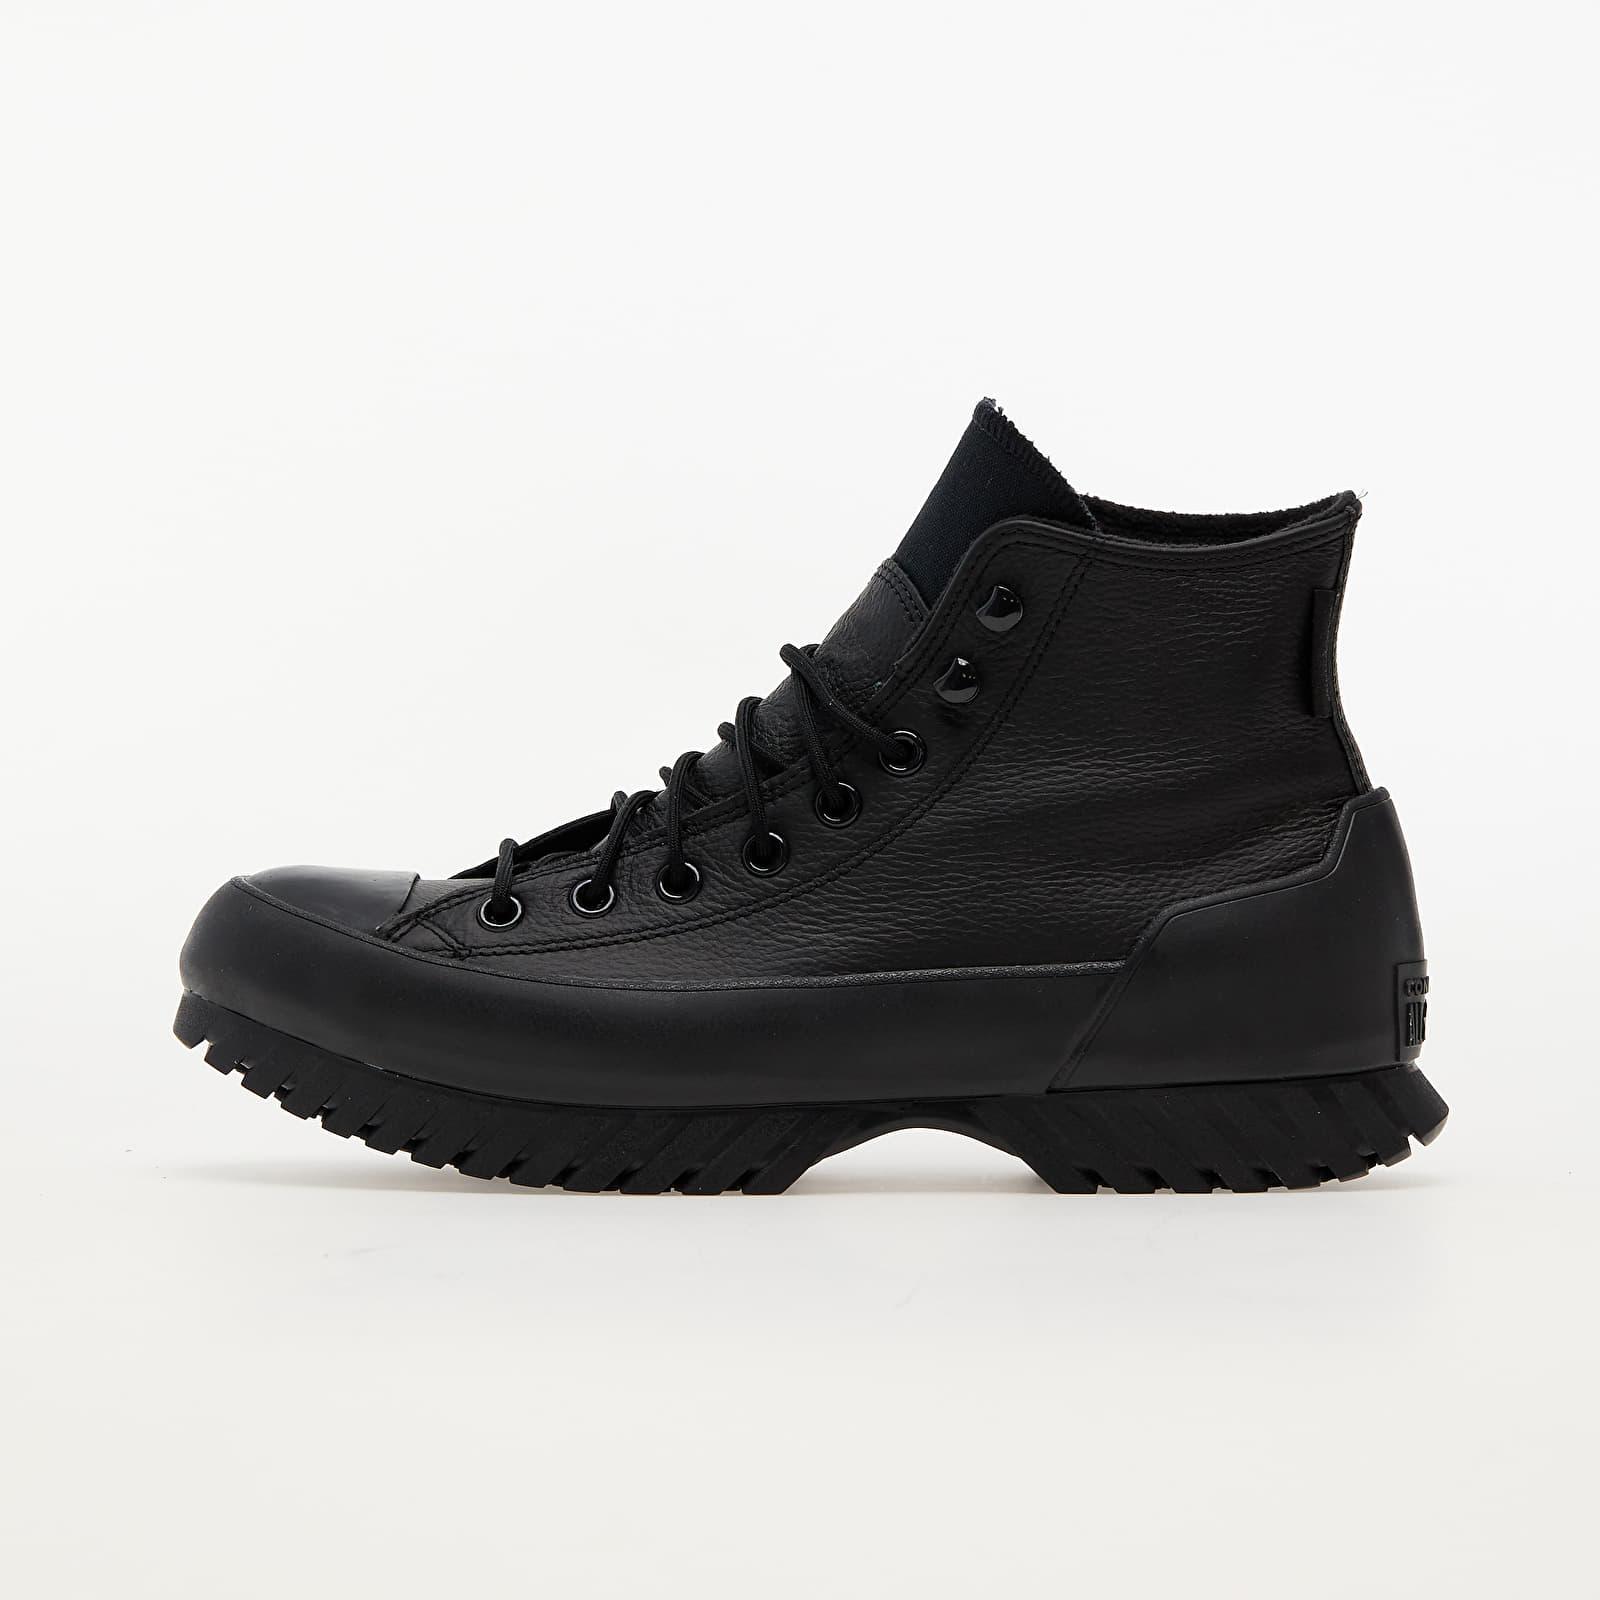 Converse Chuck Taylor All Star Lugged Winter 2.0 Black/ Black/ Bold Mandarin EUR 37.5